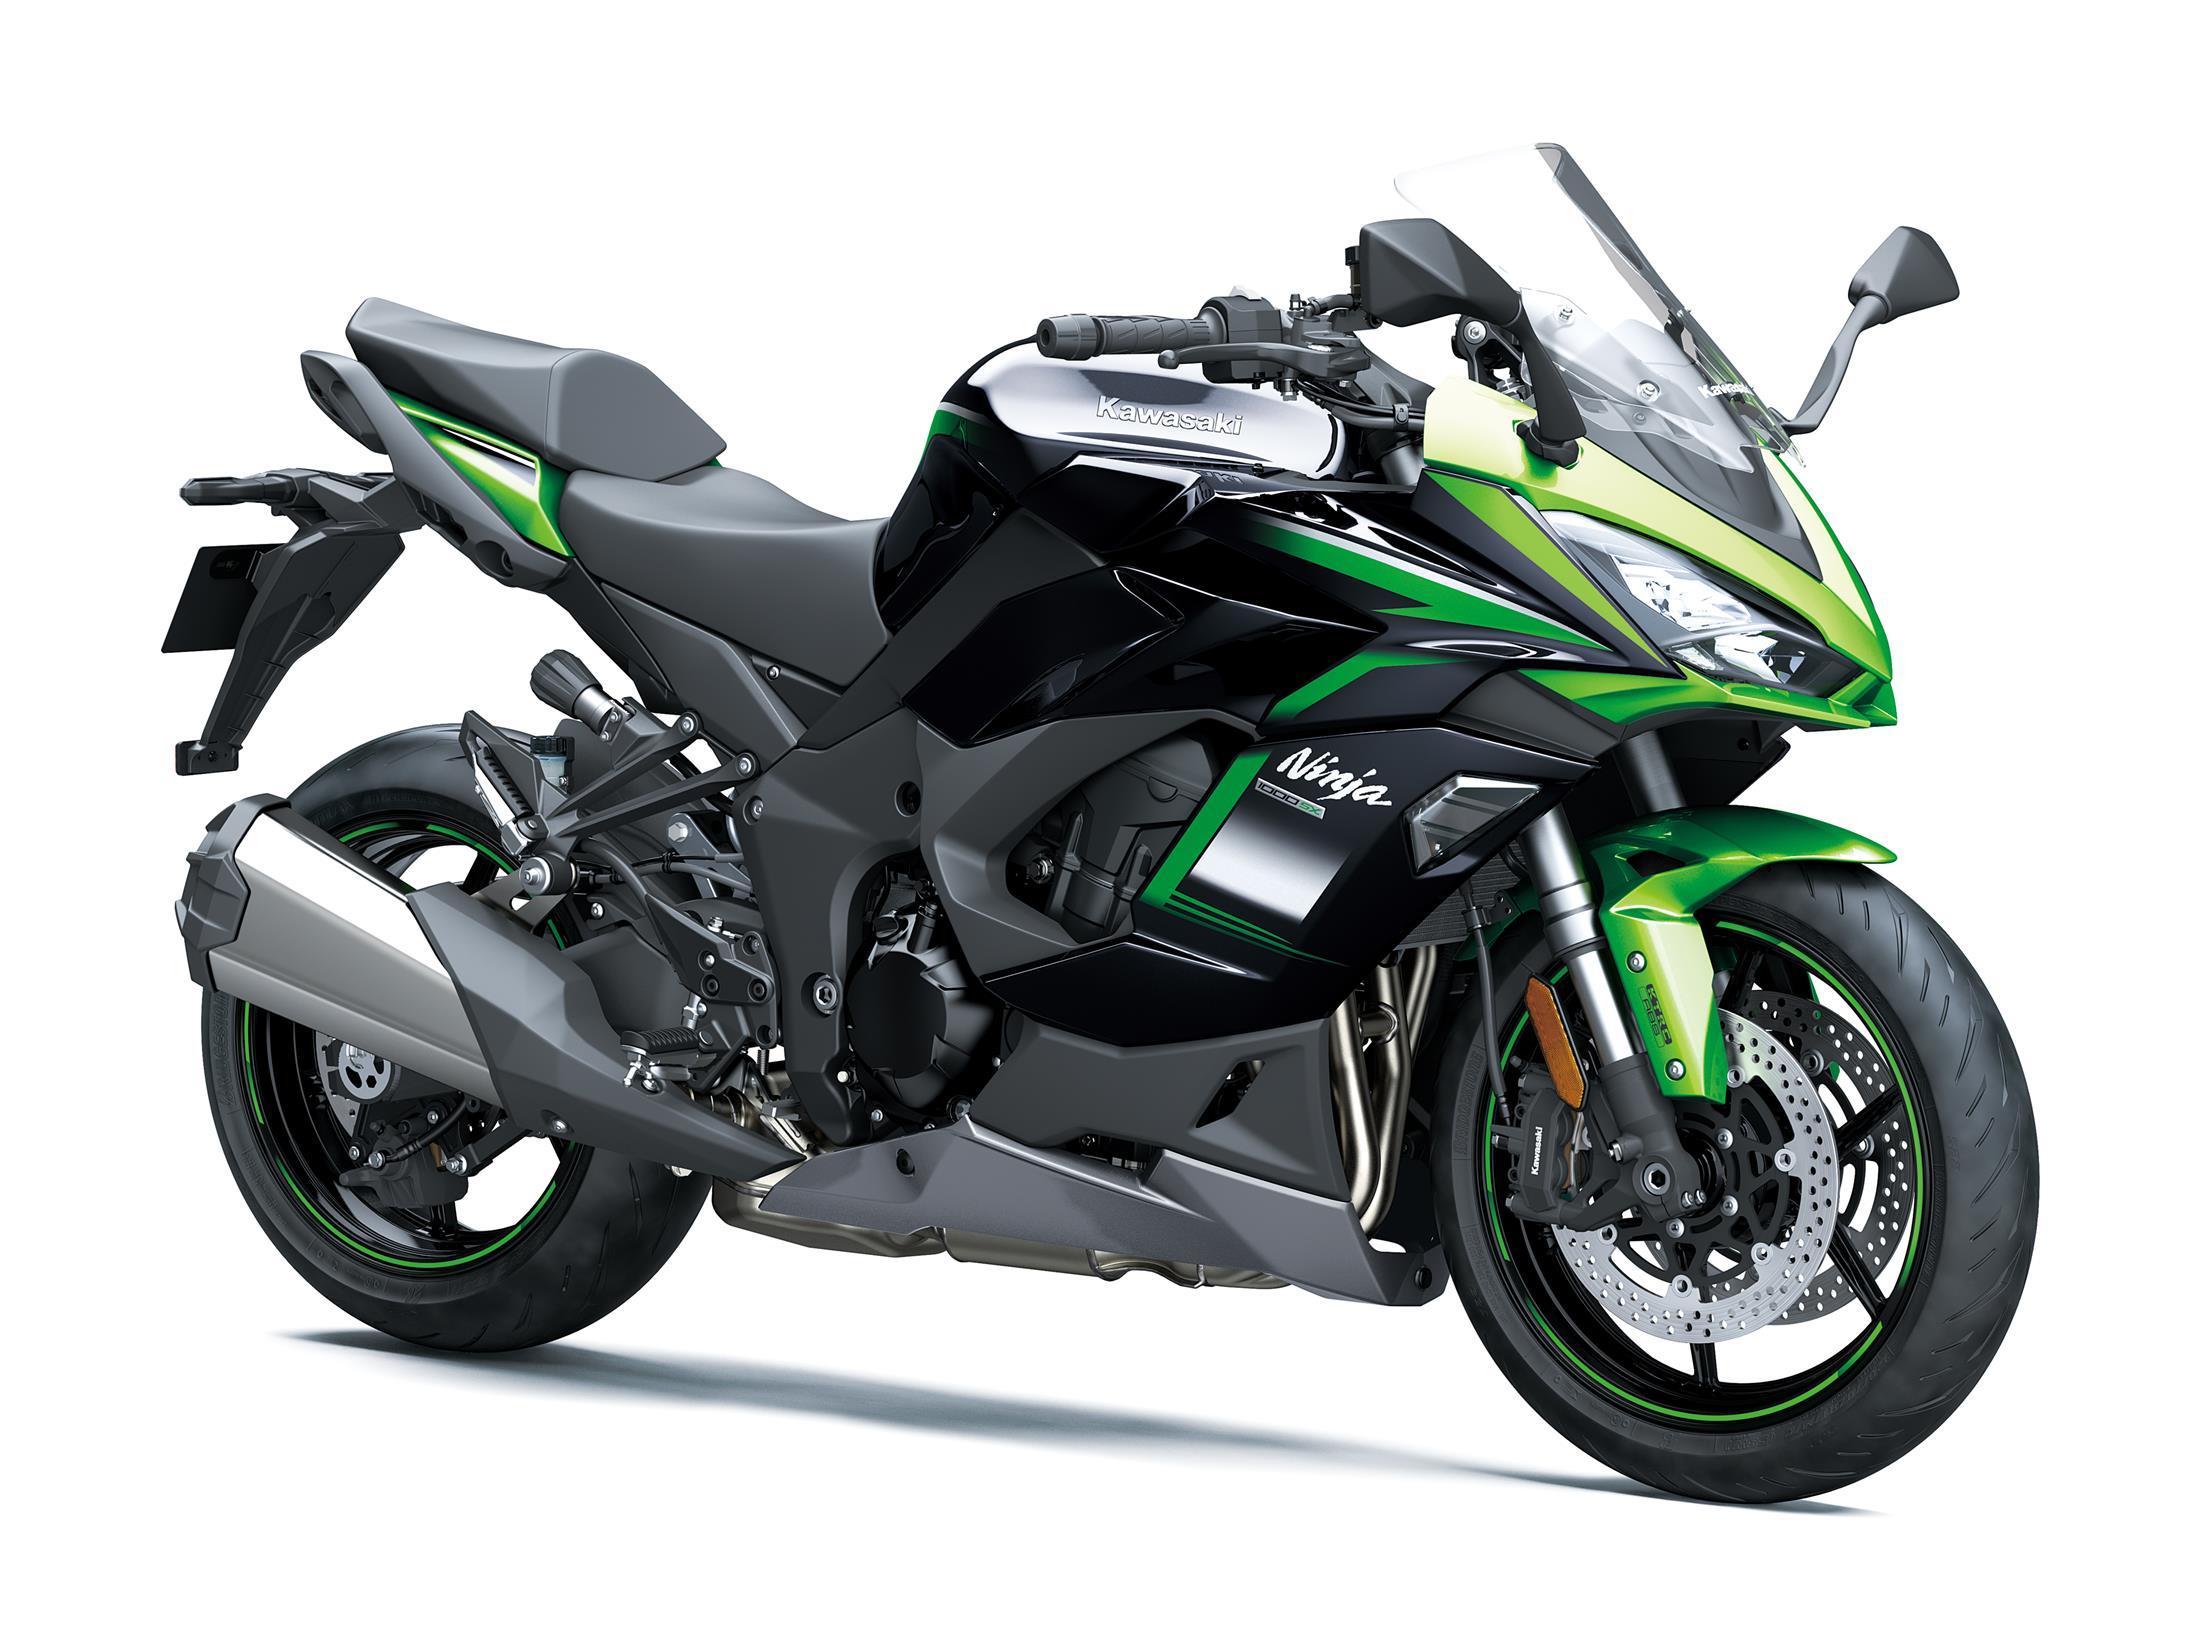 2021 Ninja 1000SX